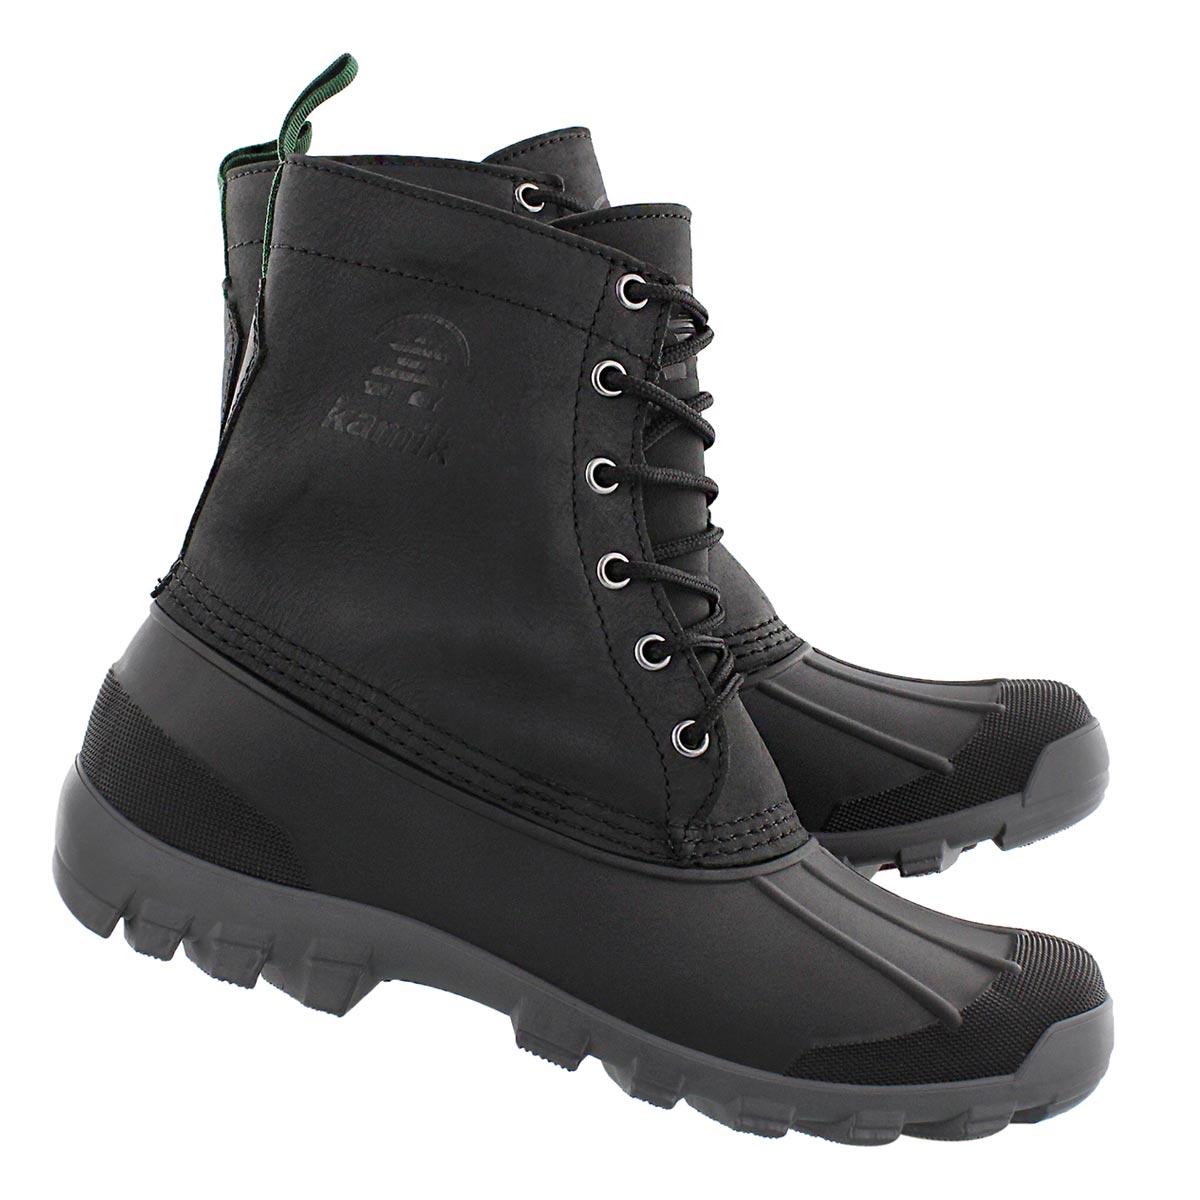 Mns Yukon6 black wtrprf winter boot